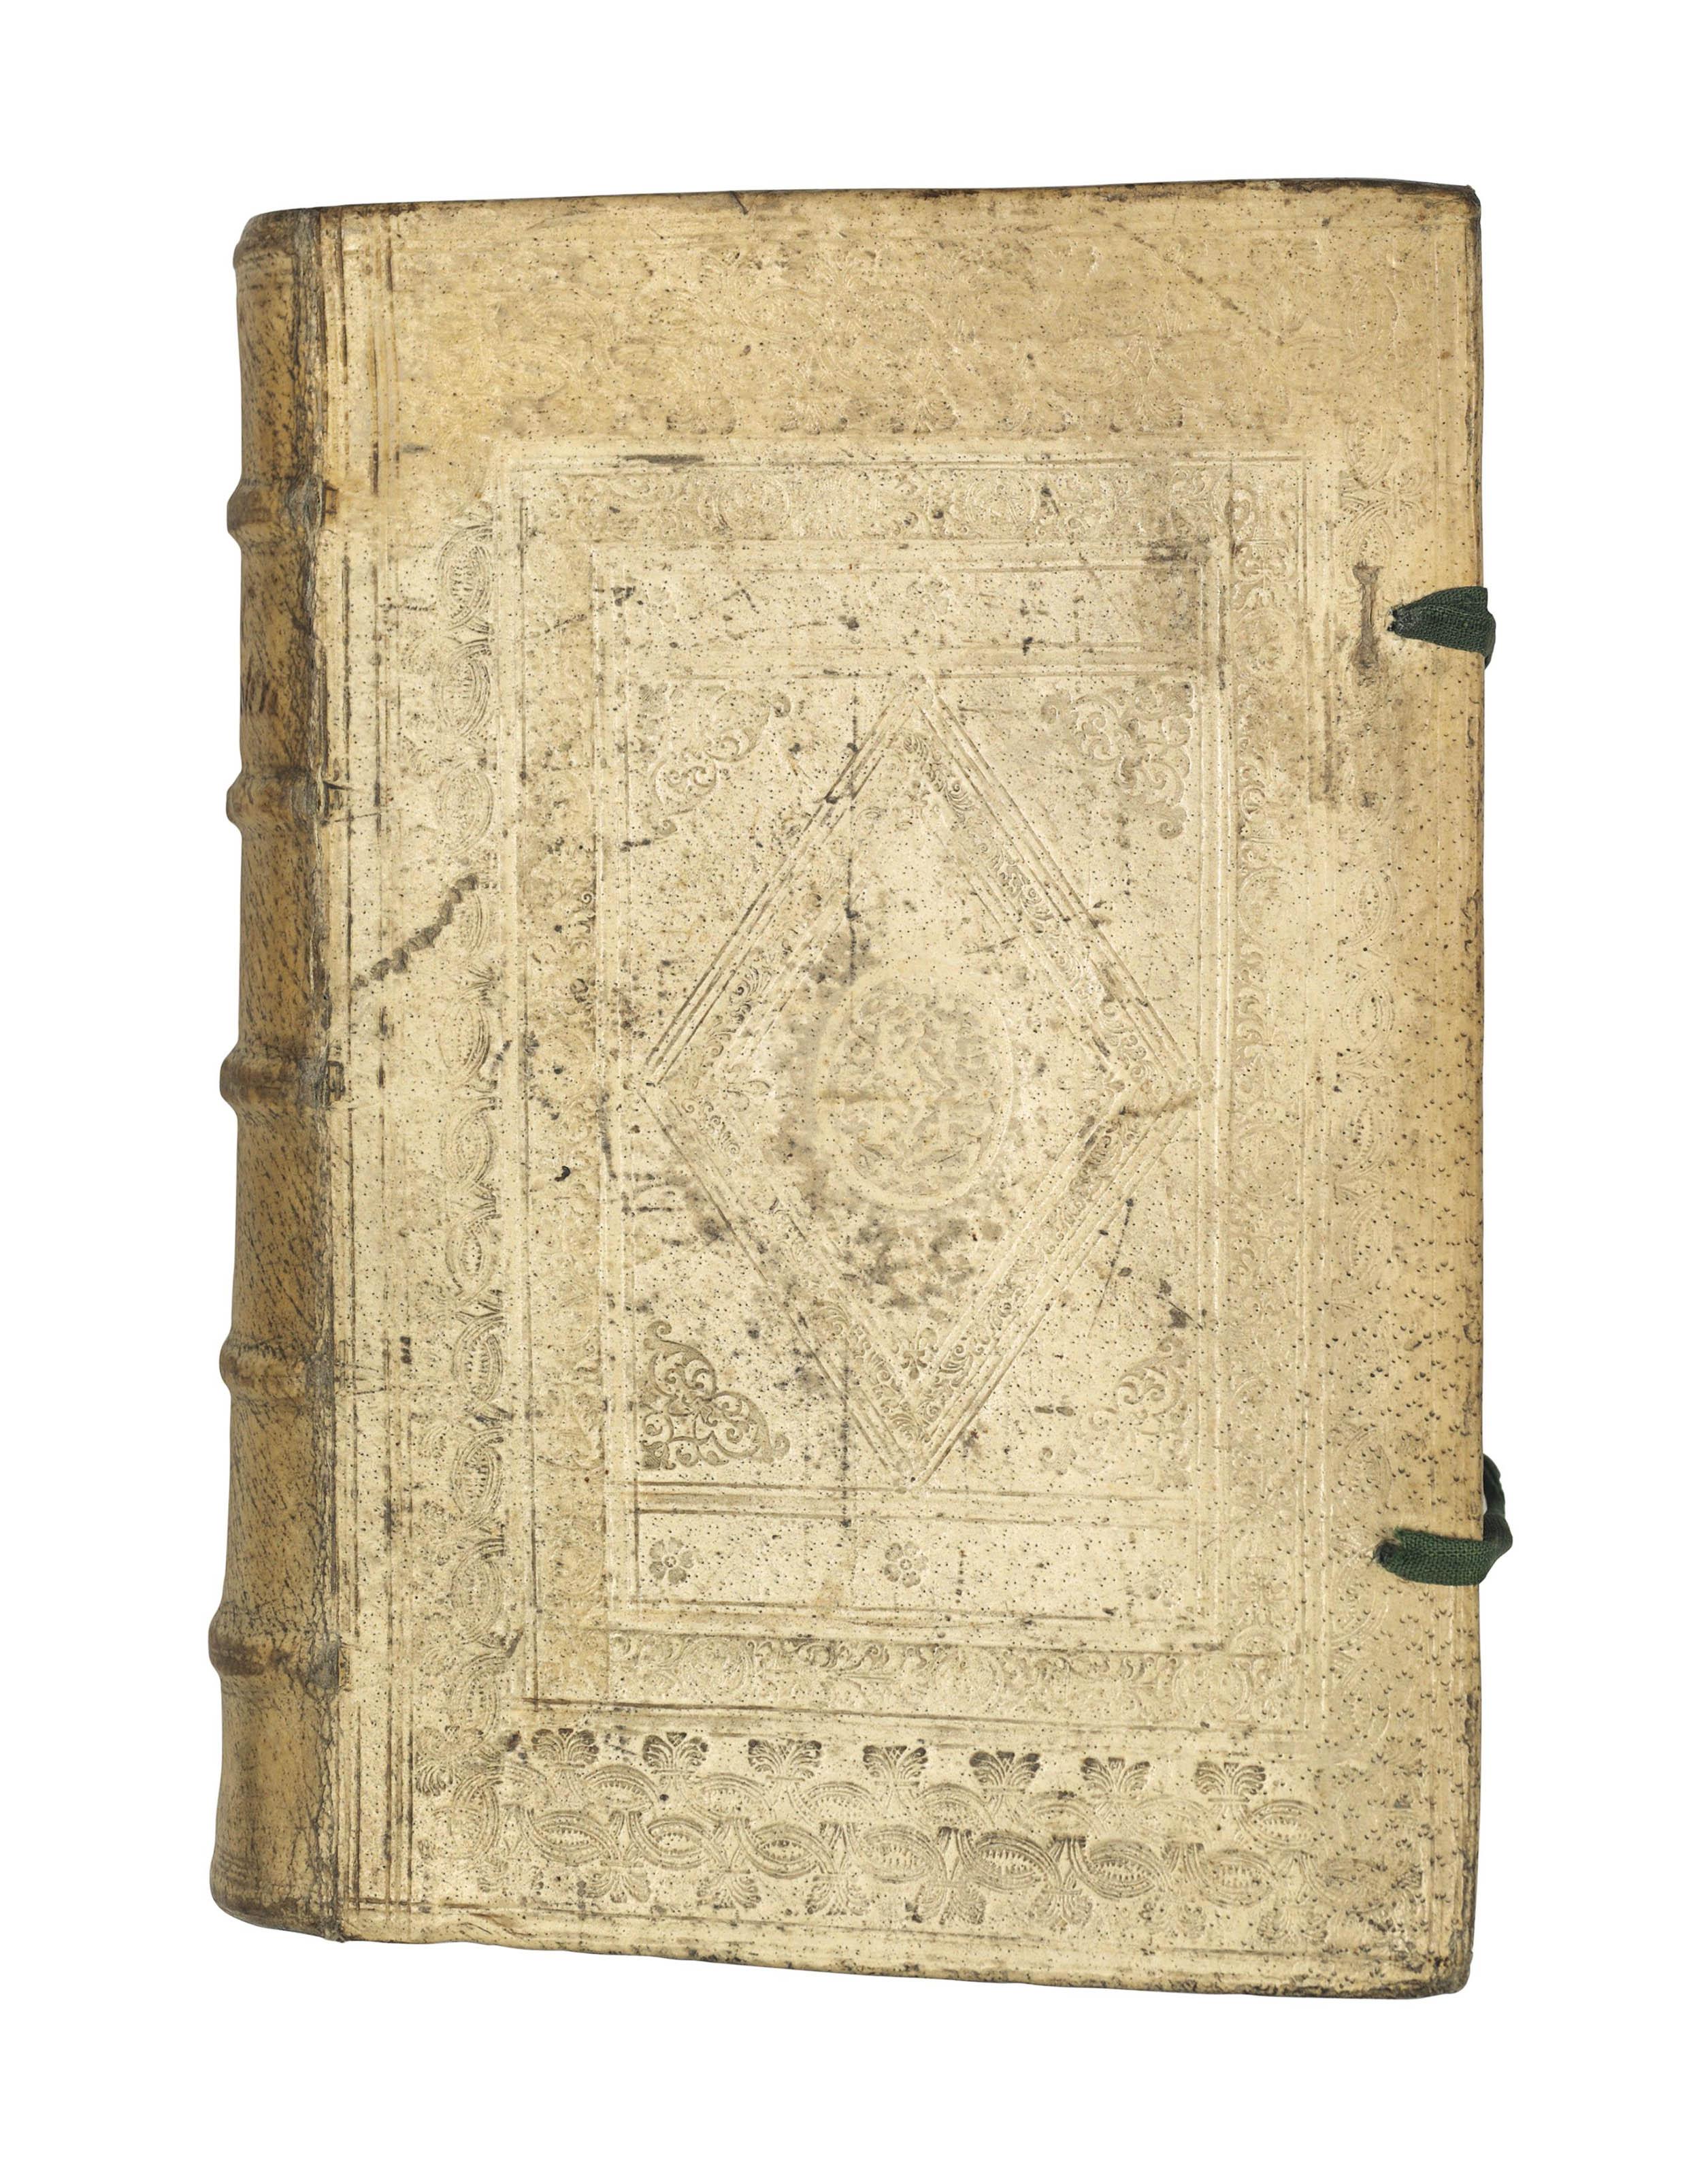 MÜNSTER, Sebastian (1489-1552). Cosmographiae universalis Lib. VI. Basel: Ex Officina Henricpetrina, 1572.